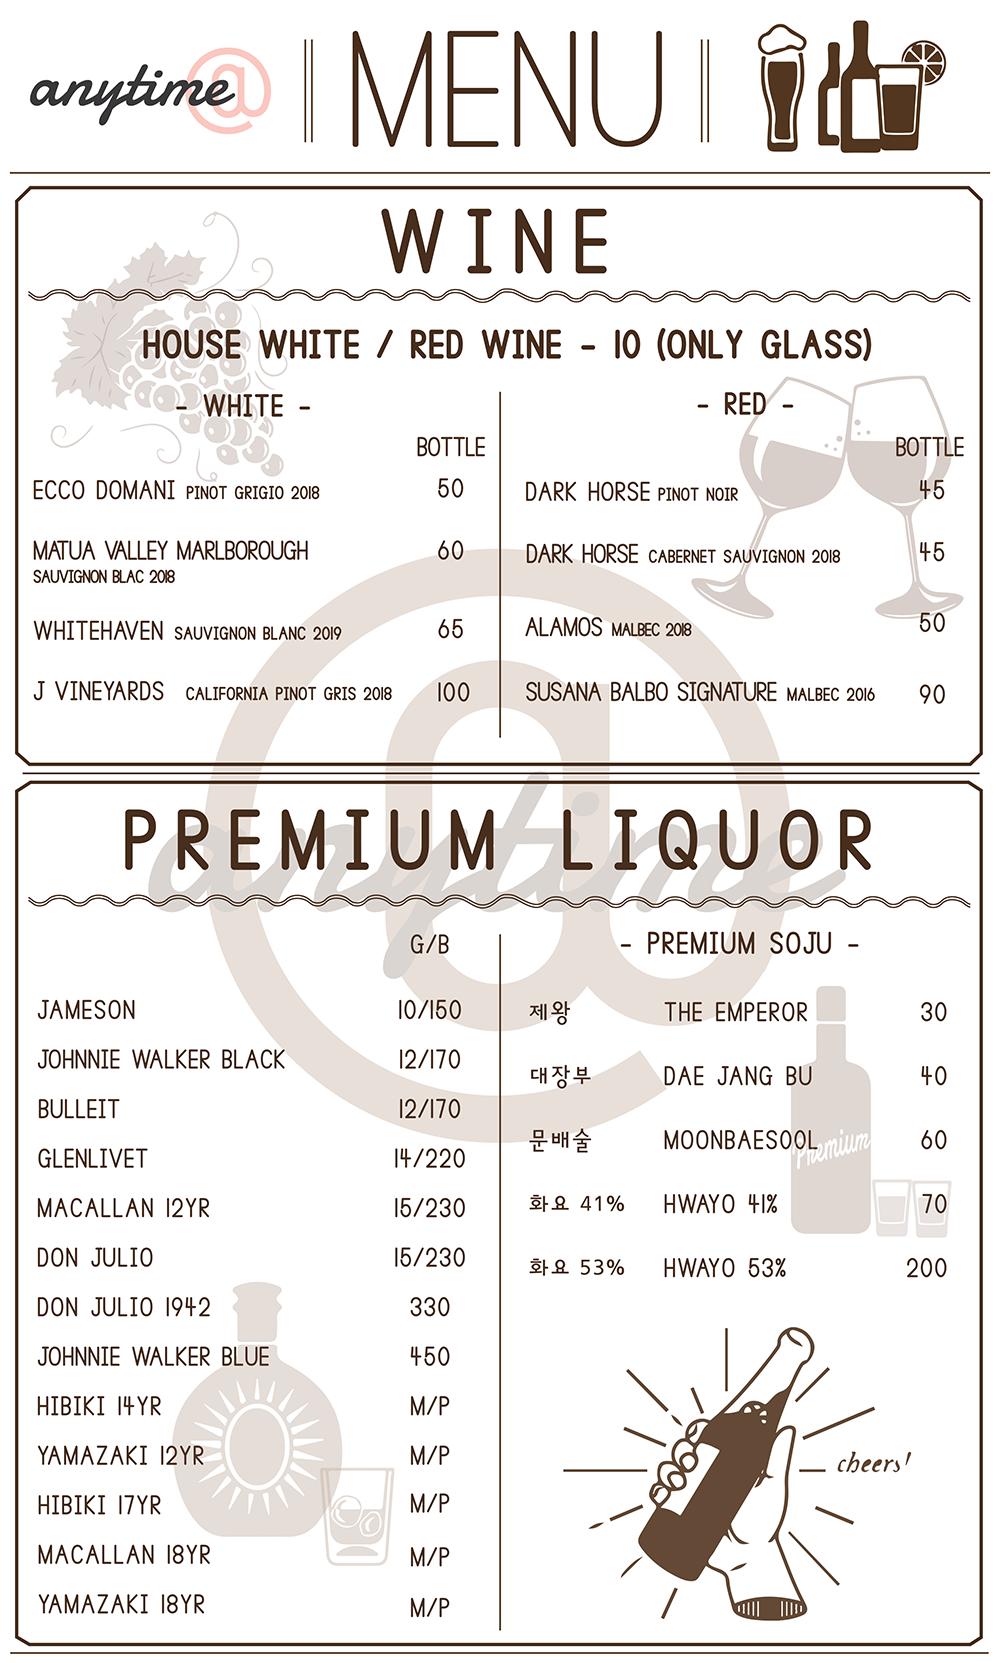 anytime-nyc-drink-menu-2.png